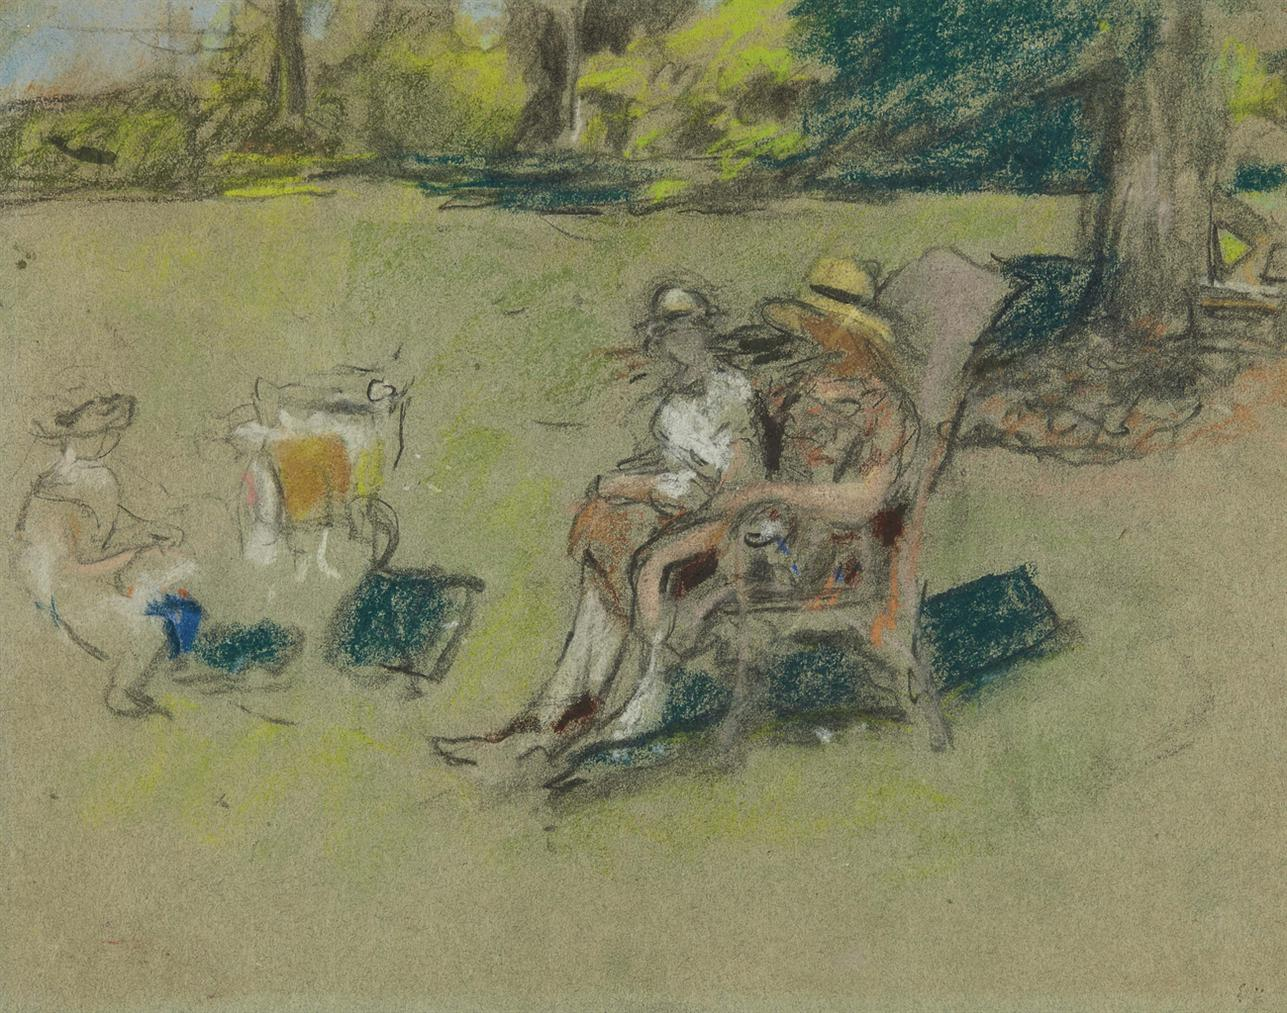 Edouard Vuillard-Madame Henri Kapferer Et Ses Enfants-1926